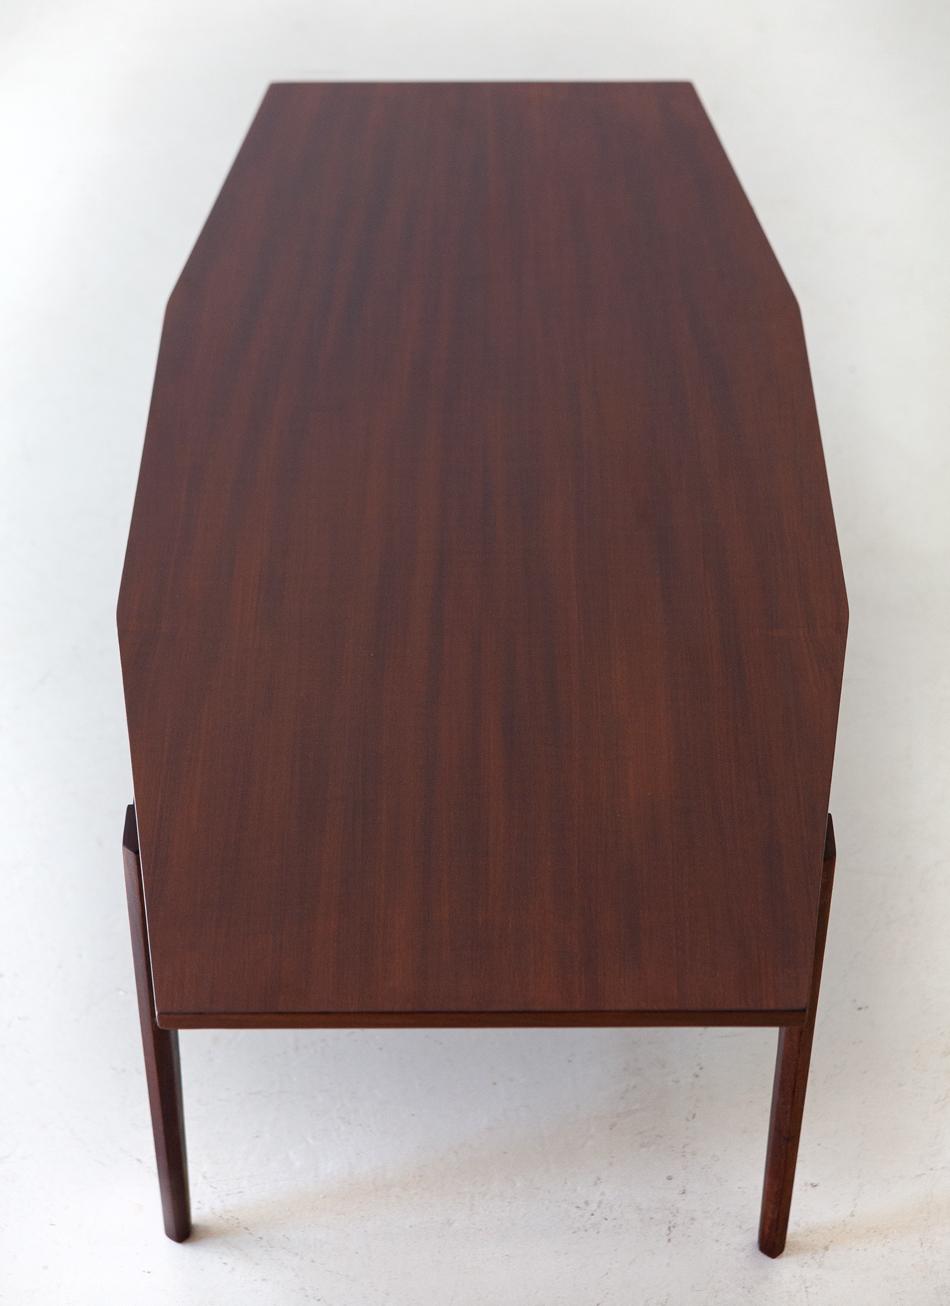 1950s-italian-modern-coffee-table-5-t90